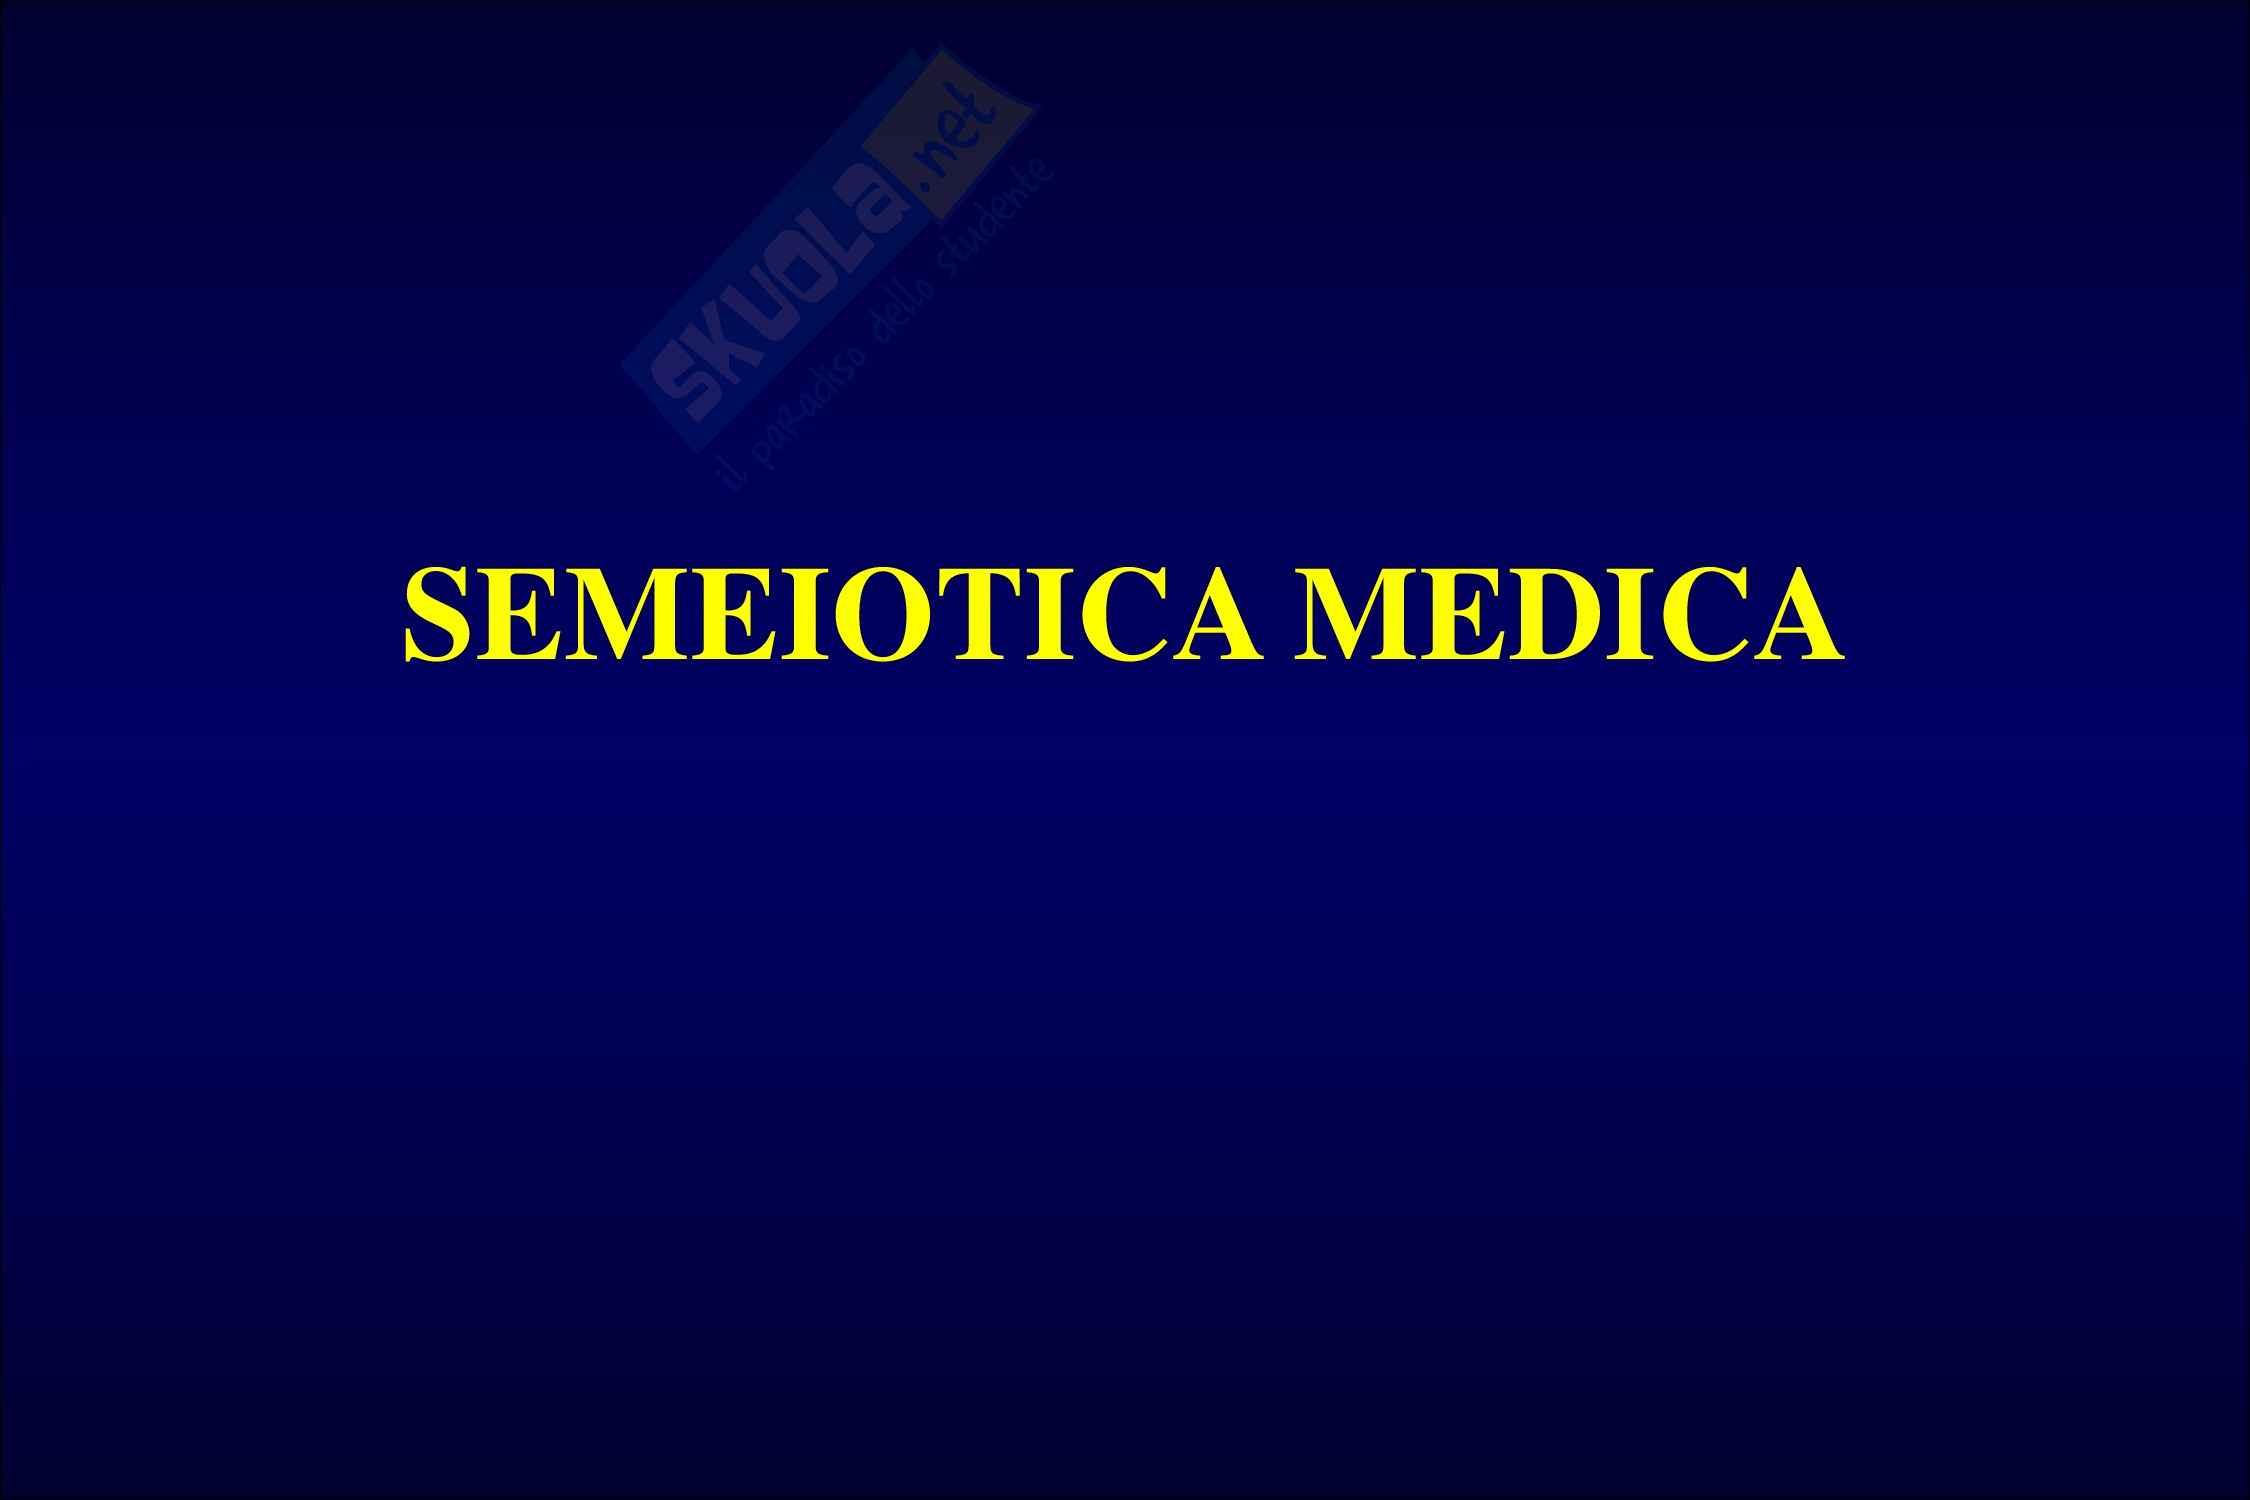 Semeiotica dermatologica